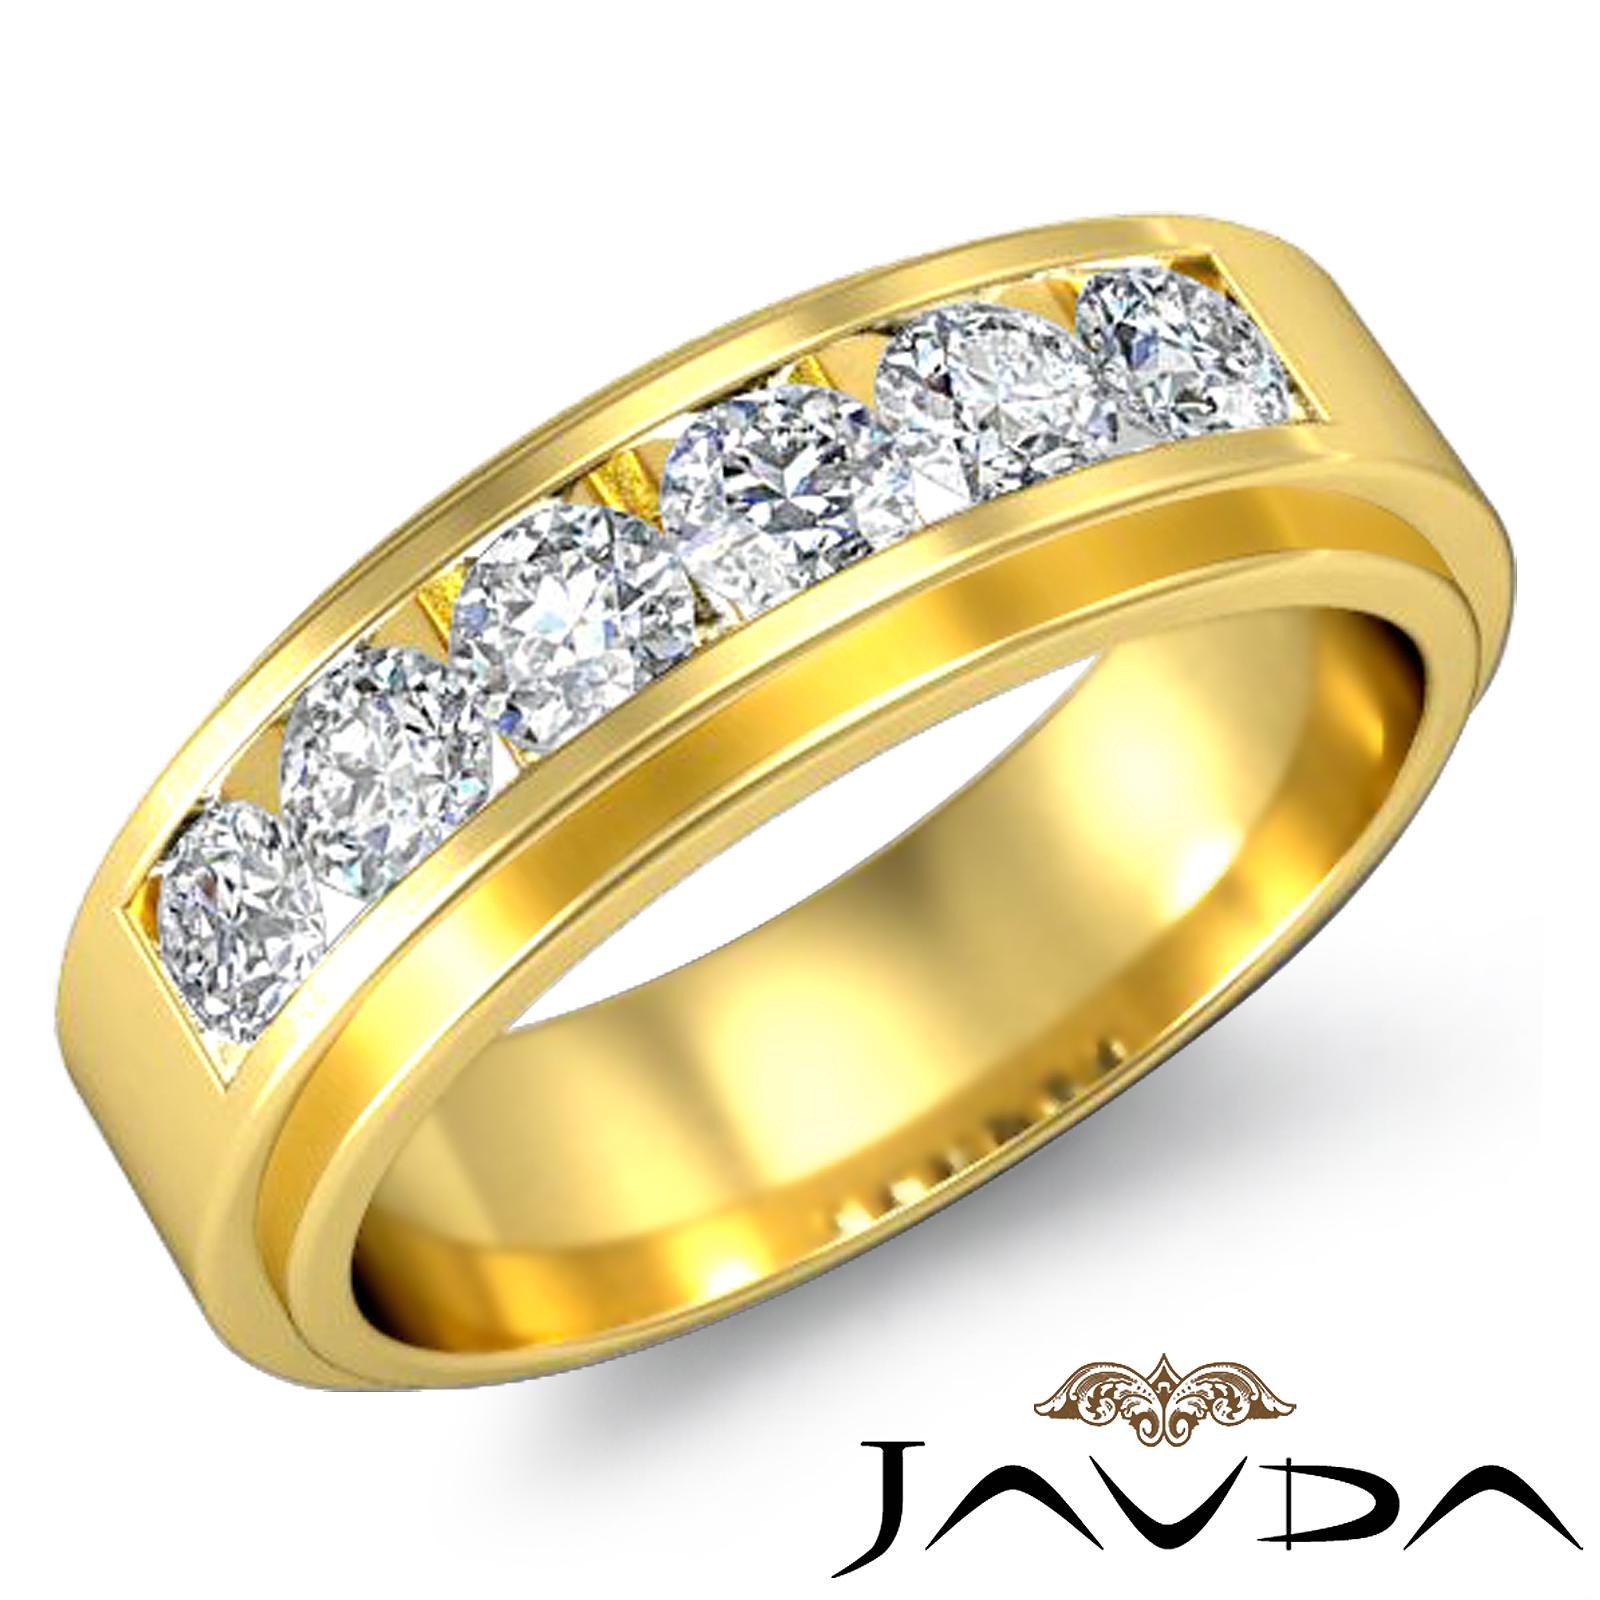 channel set diamond mens lustrous wedding band 18k yellow. Black Bedroom Furniture Sets. Home Design Ideas